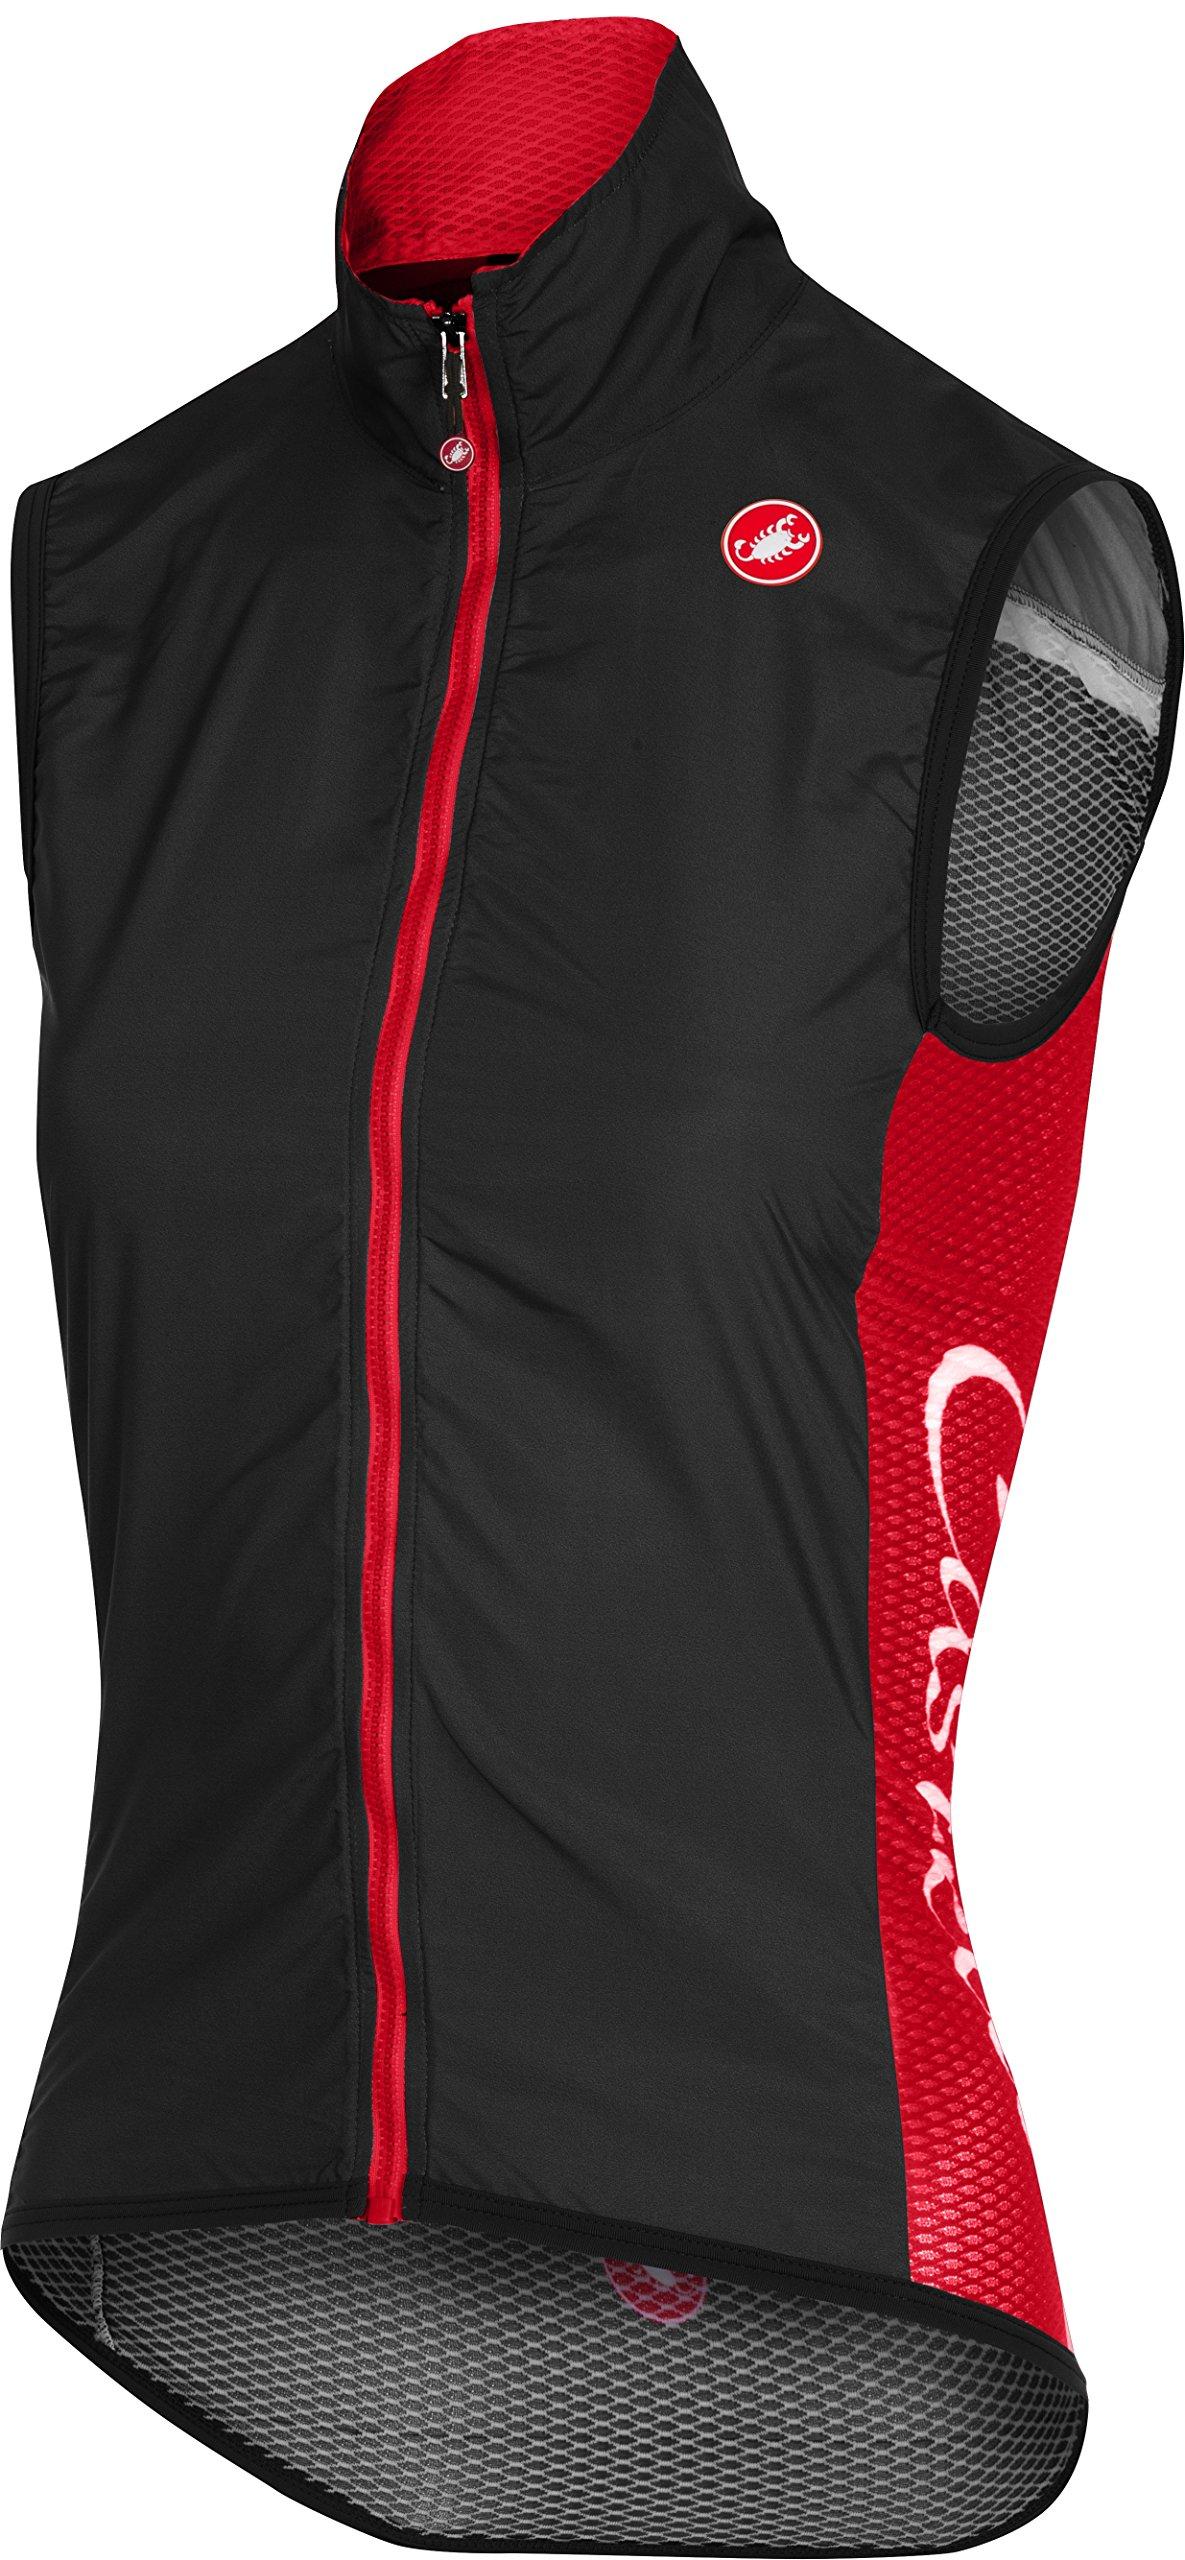 Castelli Pro Light Wind Vest - Women's Black, S